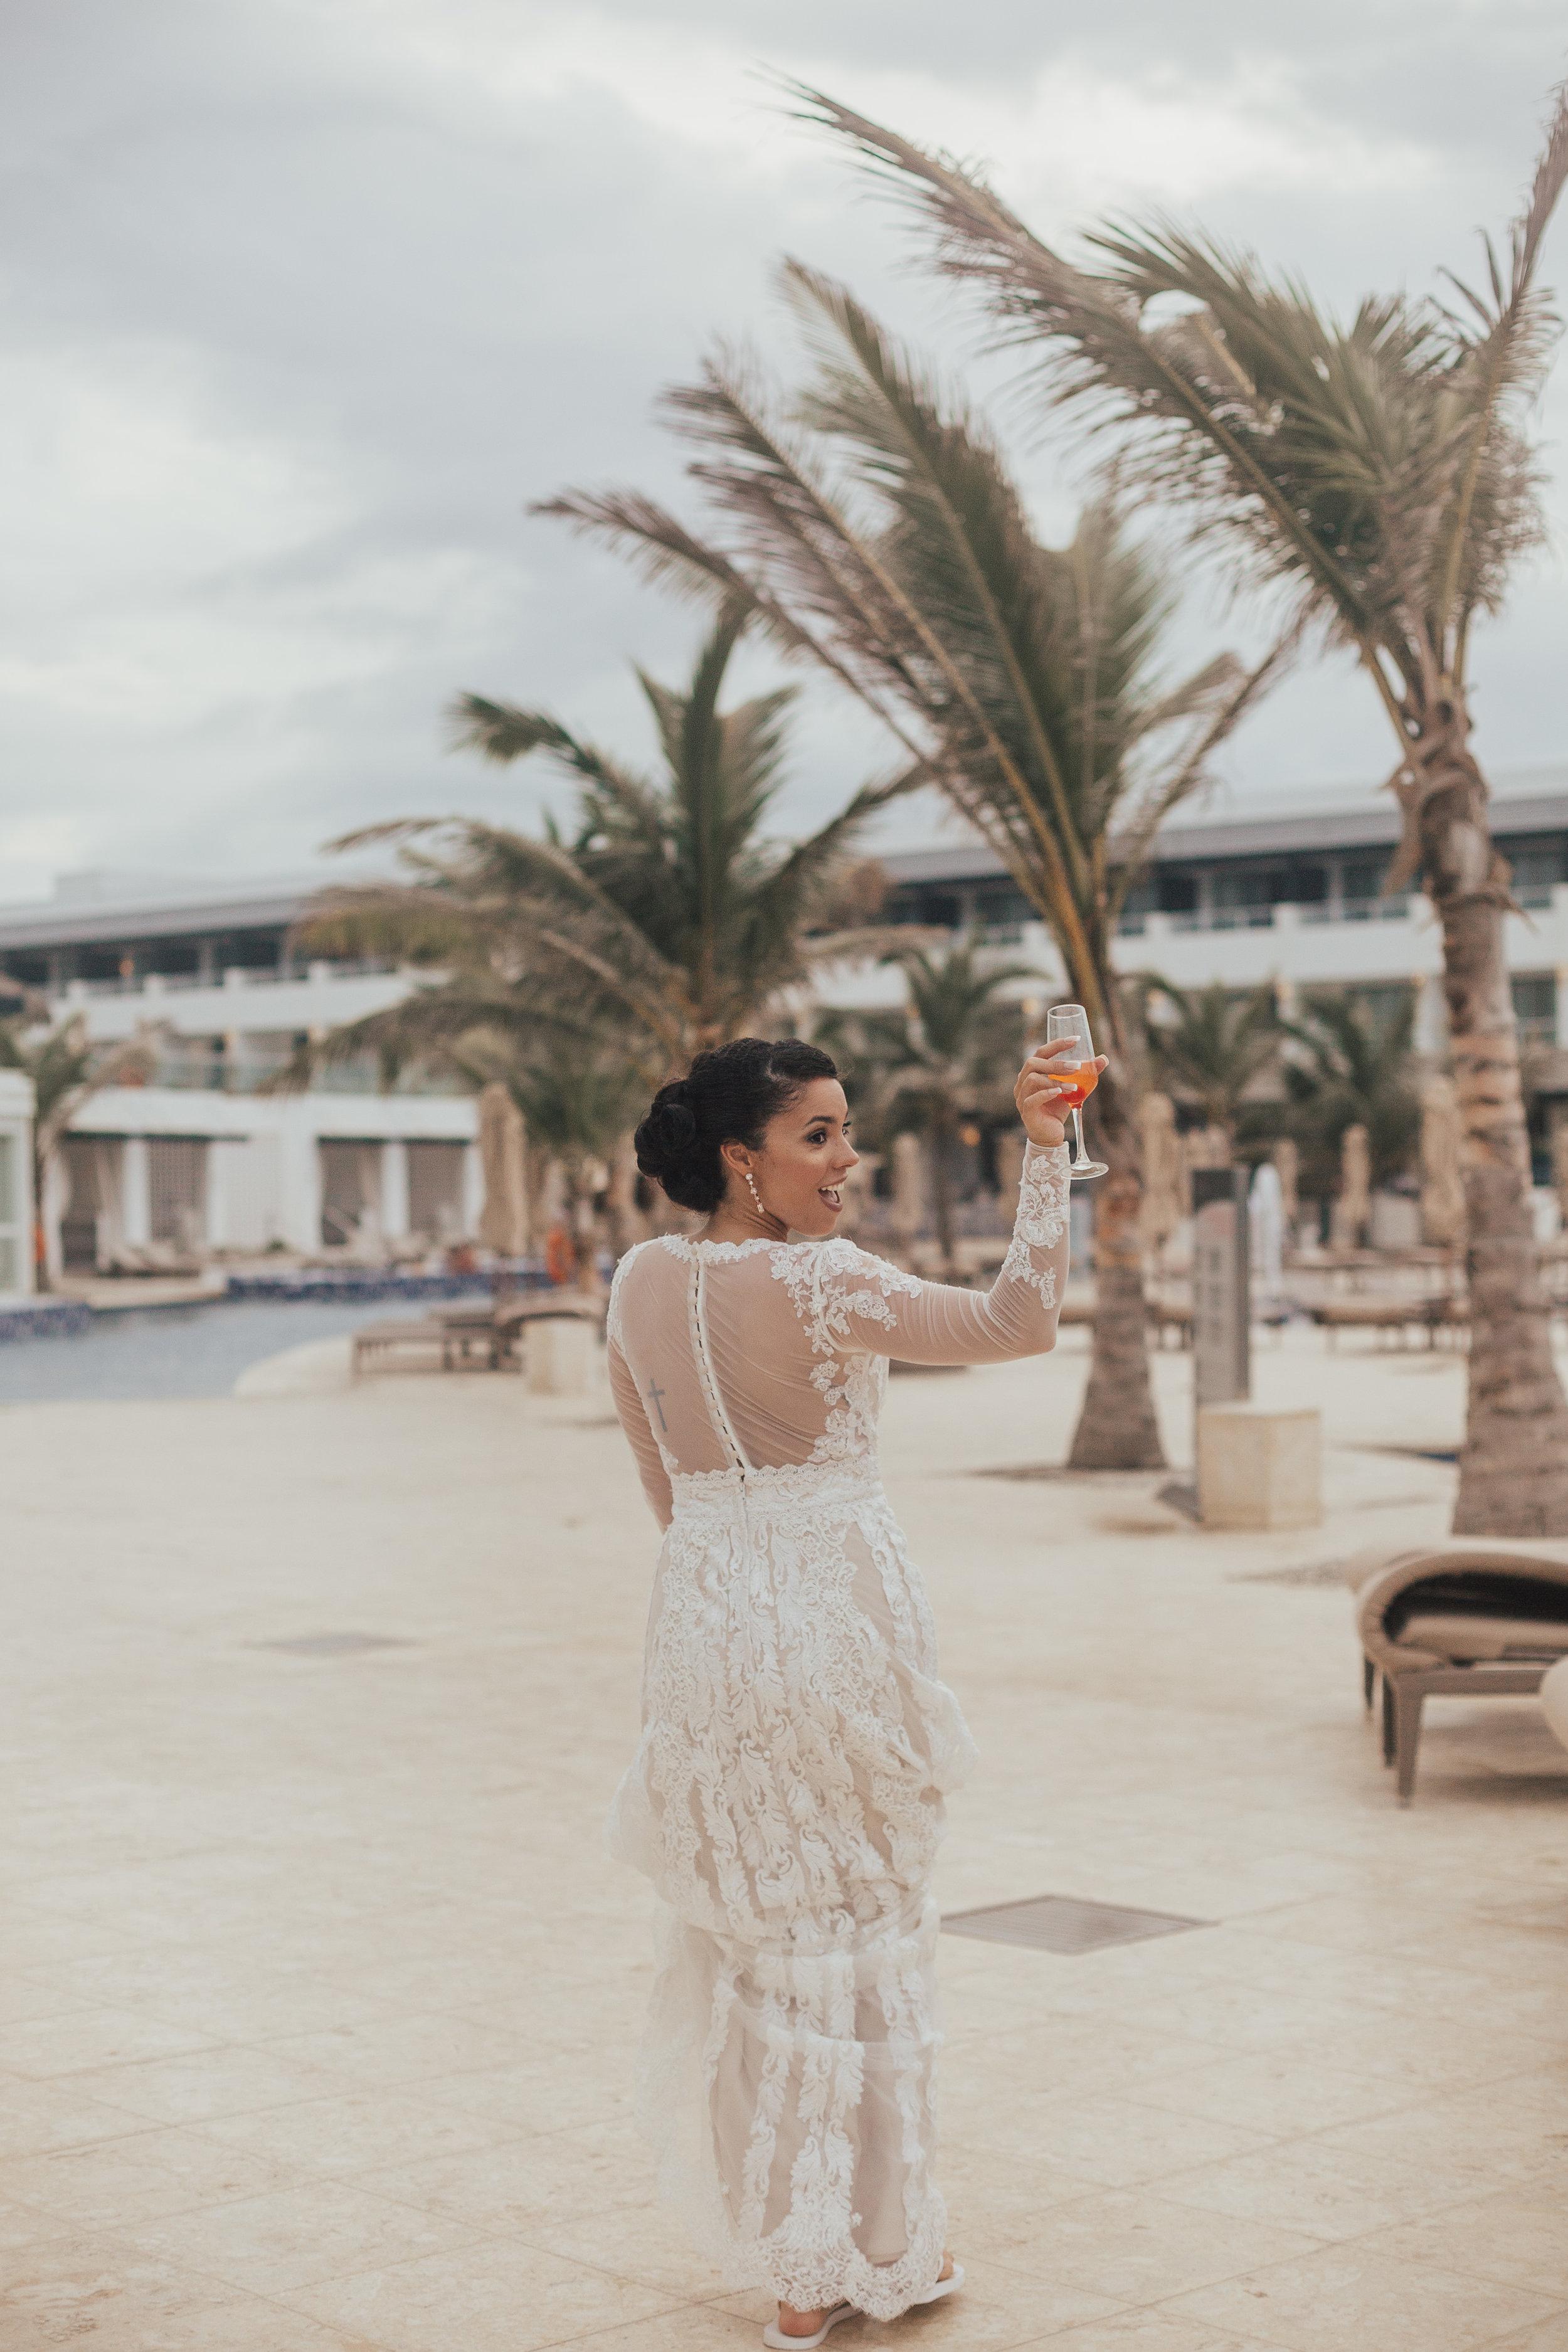 Destination-Wedding-Photographer-cleveland-wedding-photographer-elopement-photographer-tulum-wedding-photographer